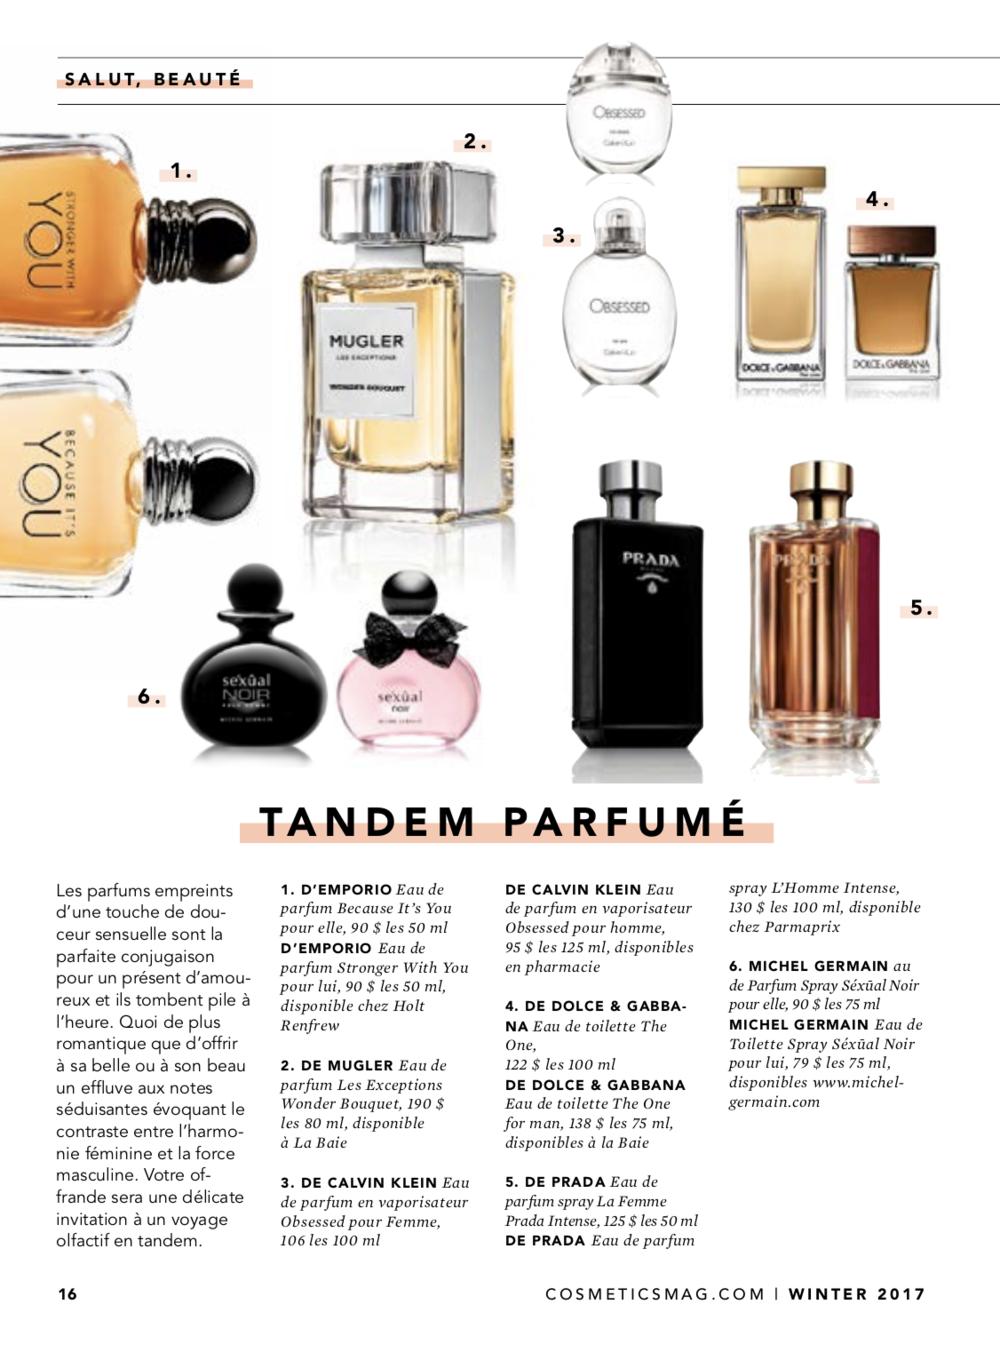 CosmeticsMag_Winter_Vania_AL.png